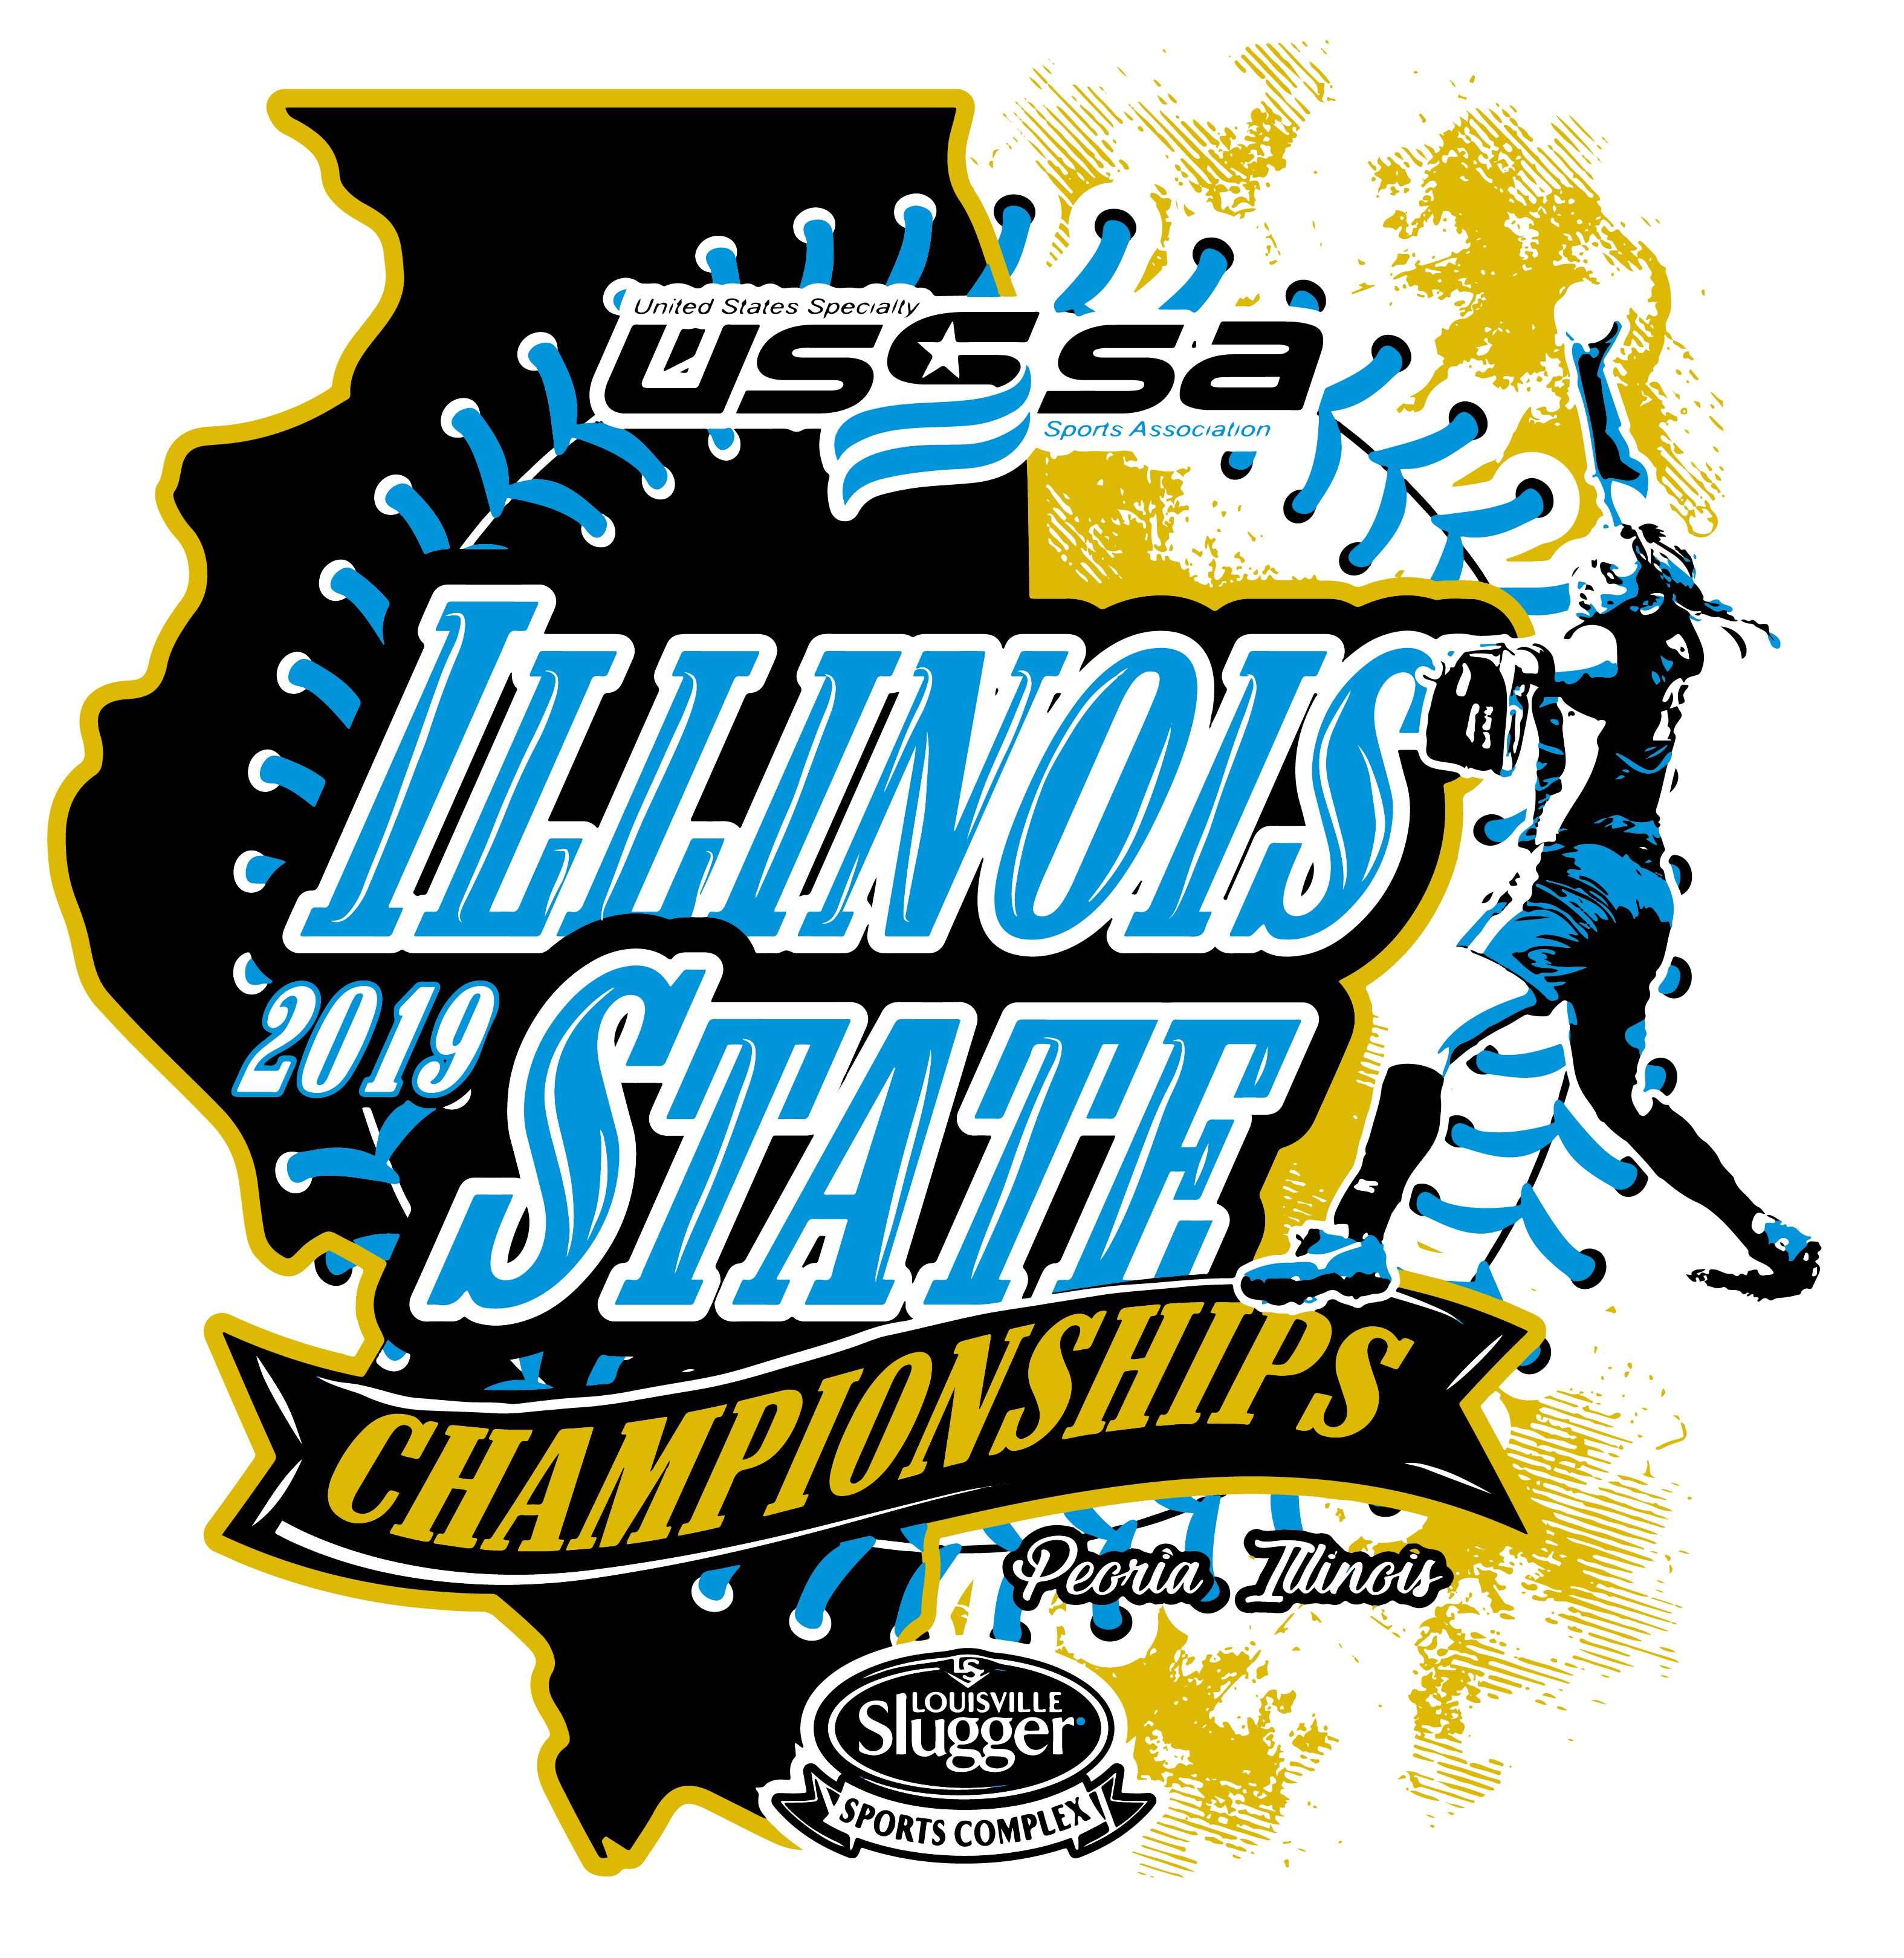 USSSA Illinois State Championships